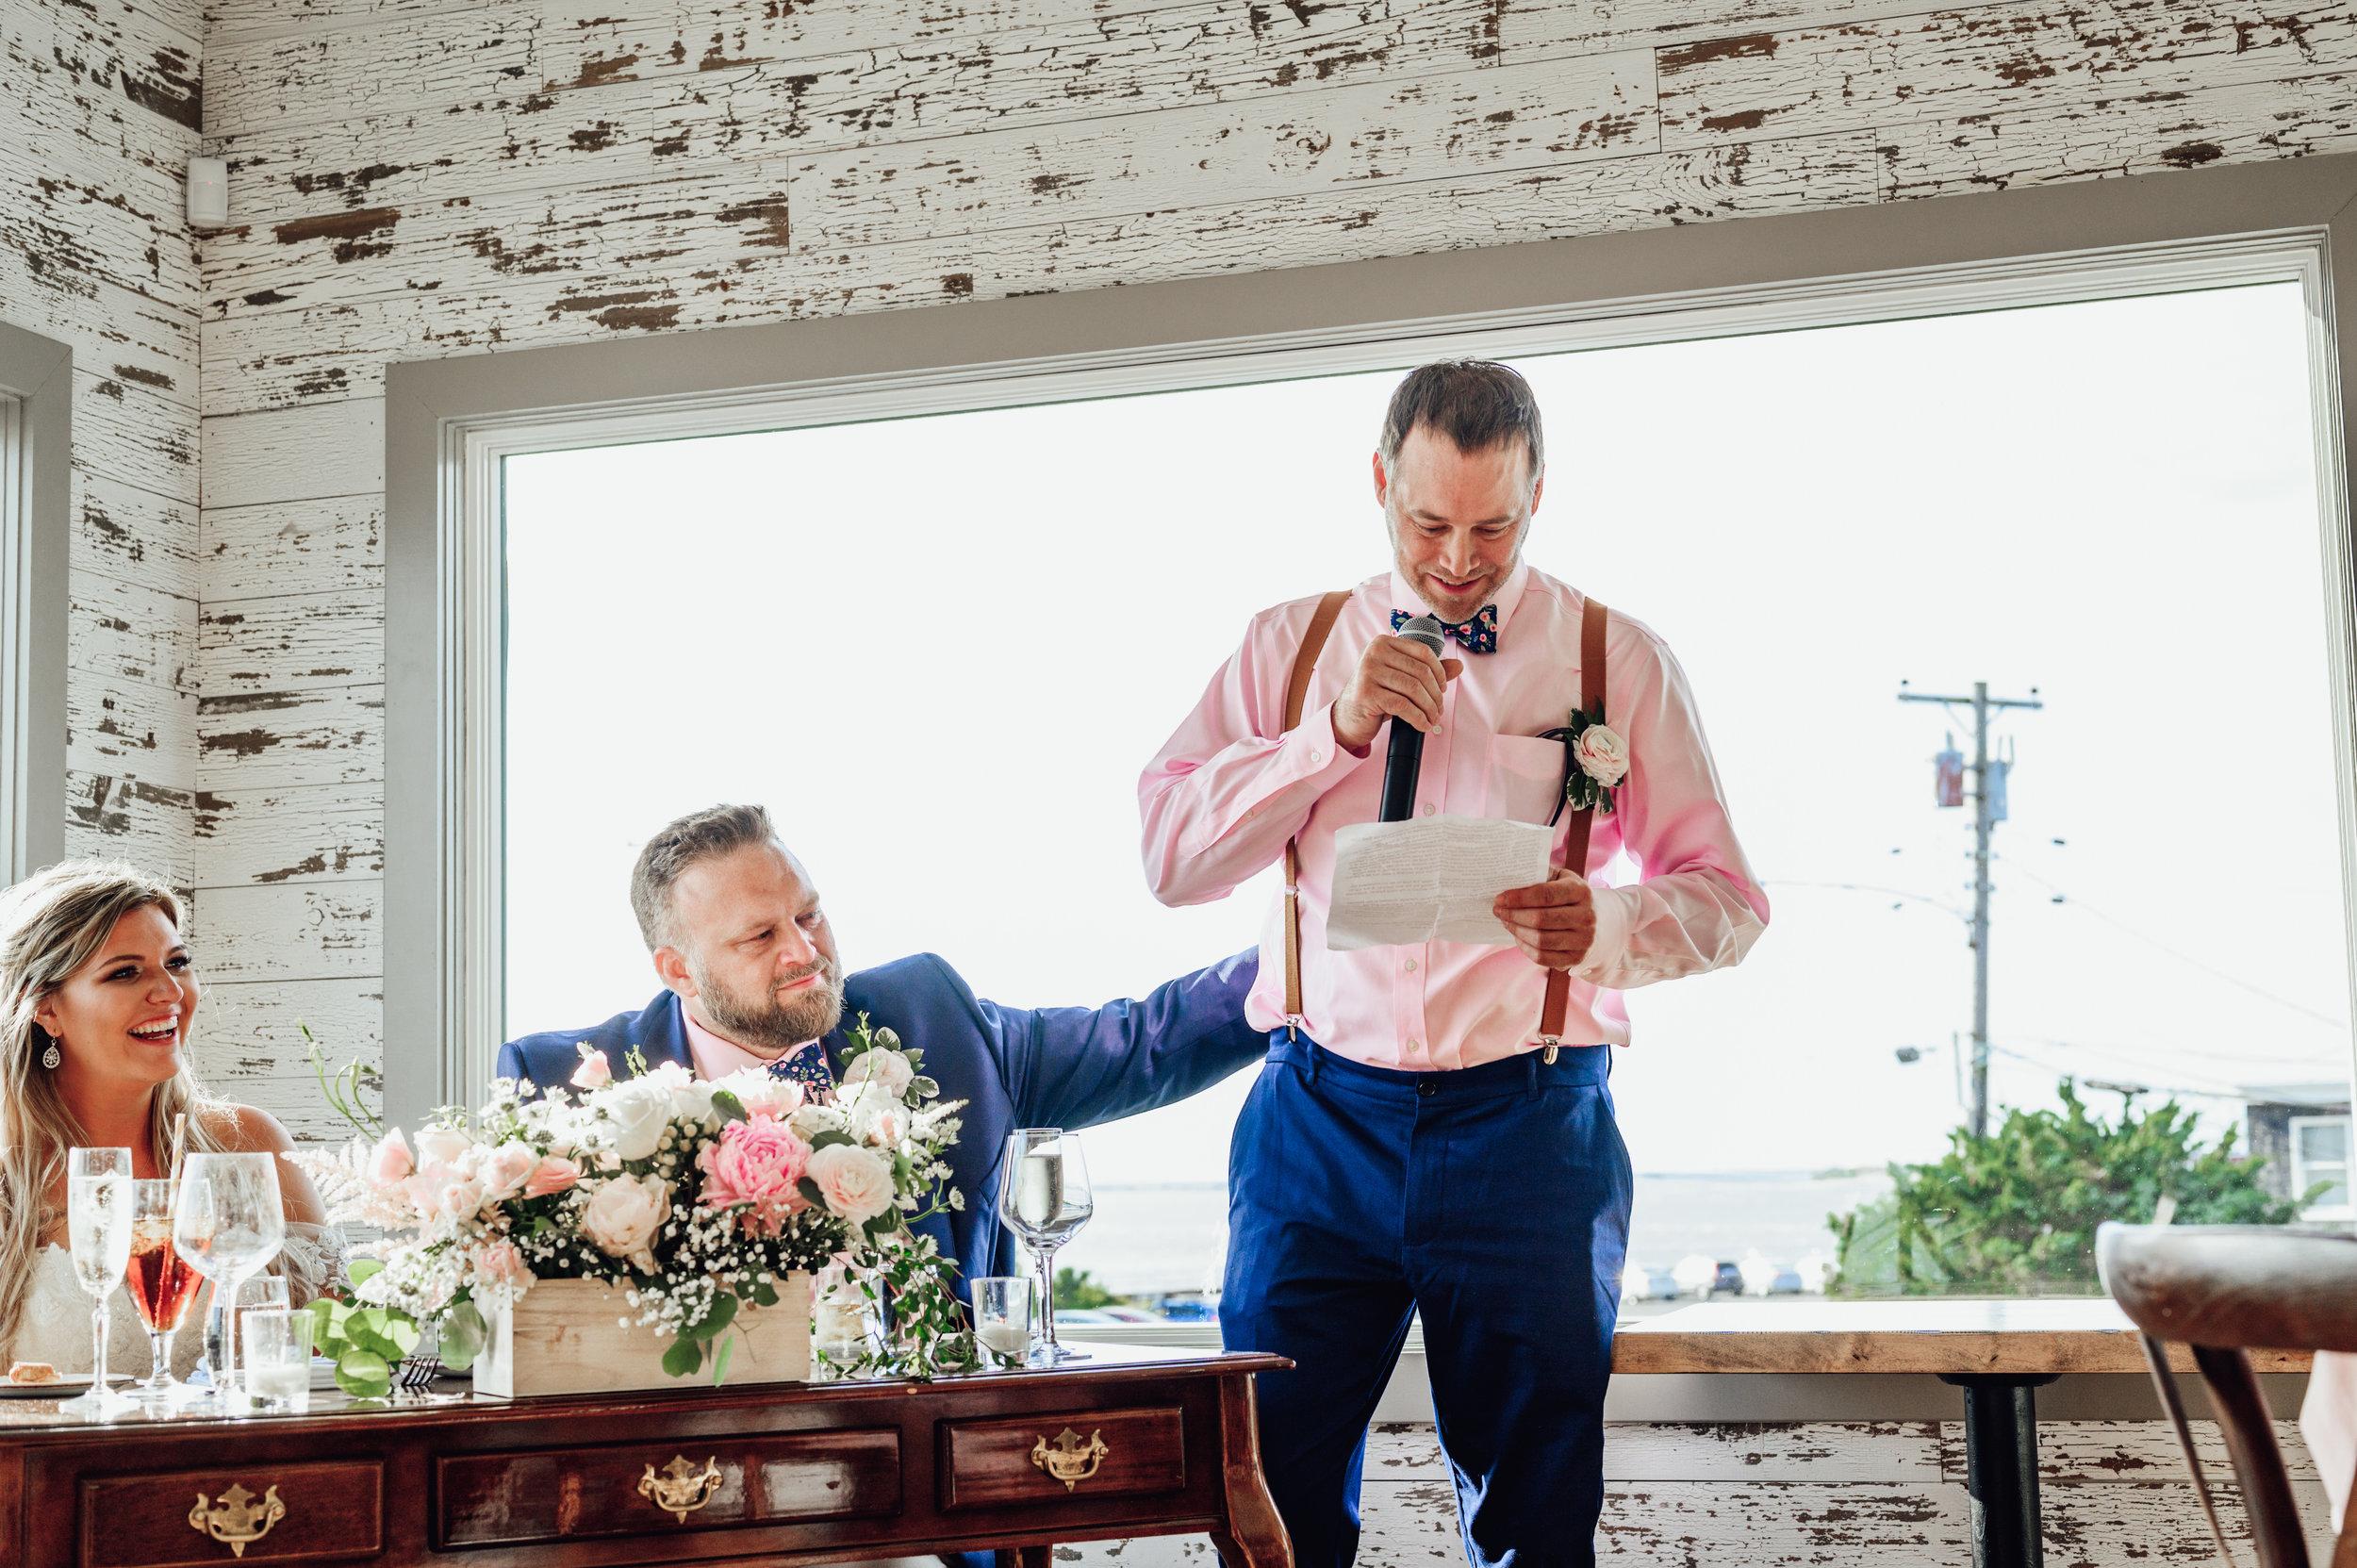 New Jersey Wedding Photographer, Felsberg Photography LBI wedding photography 103.jpg